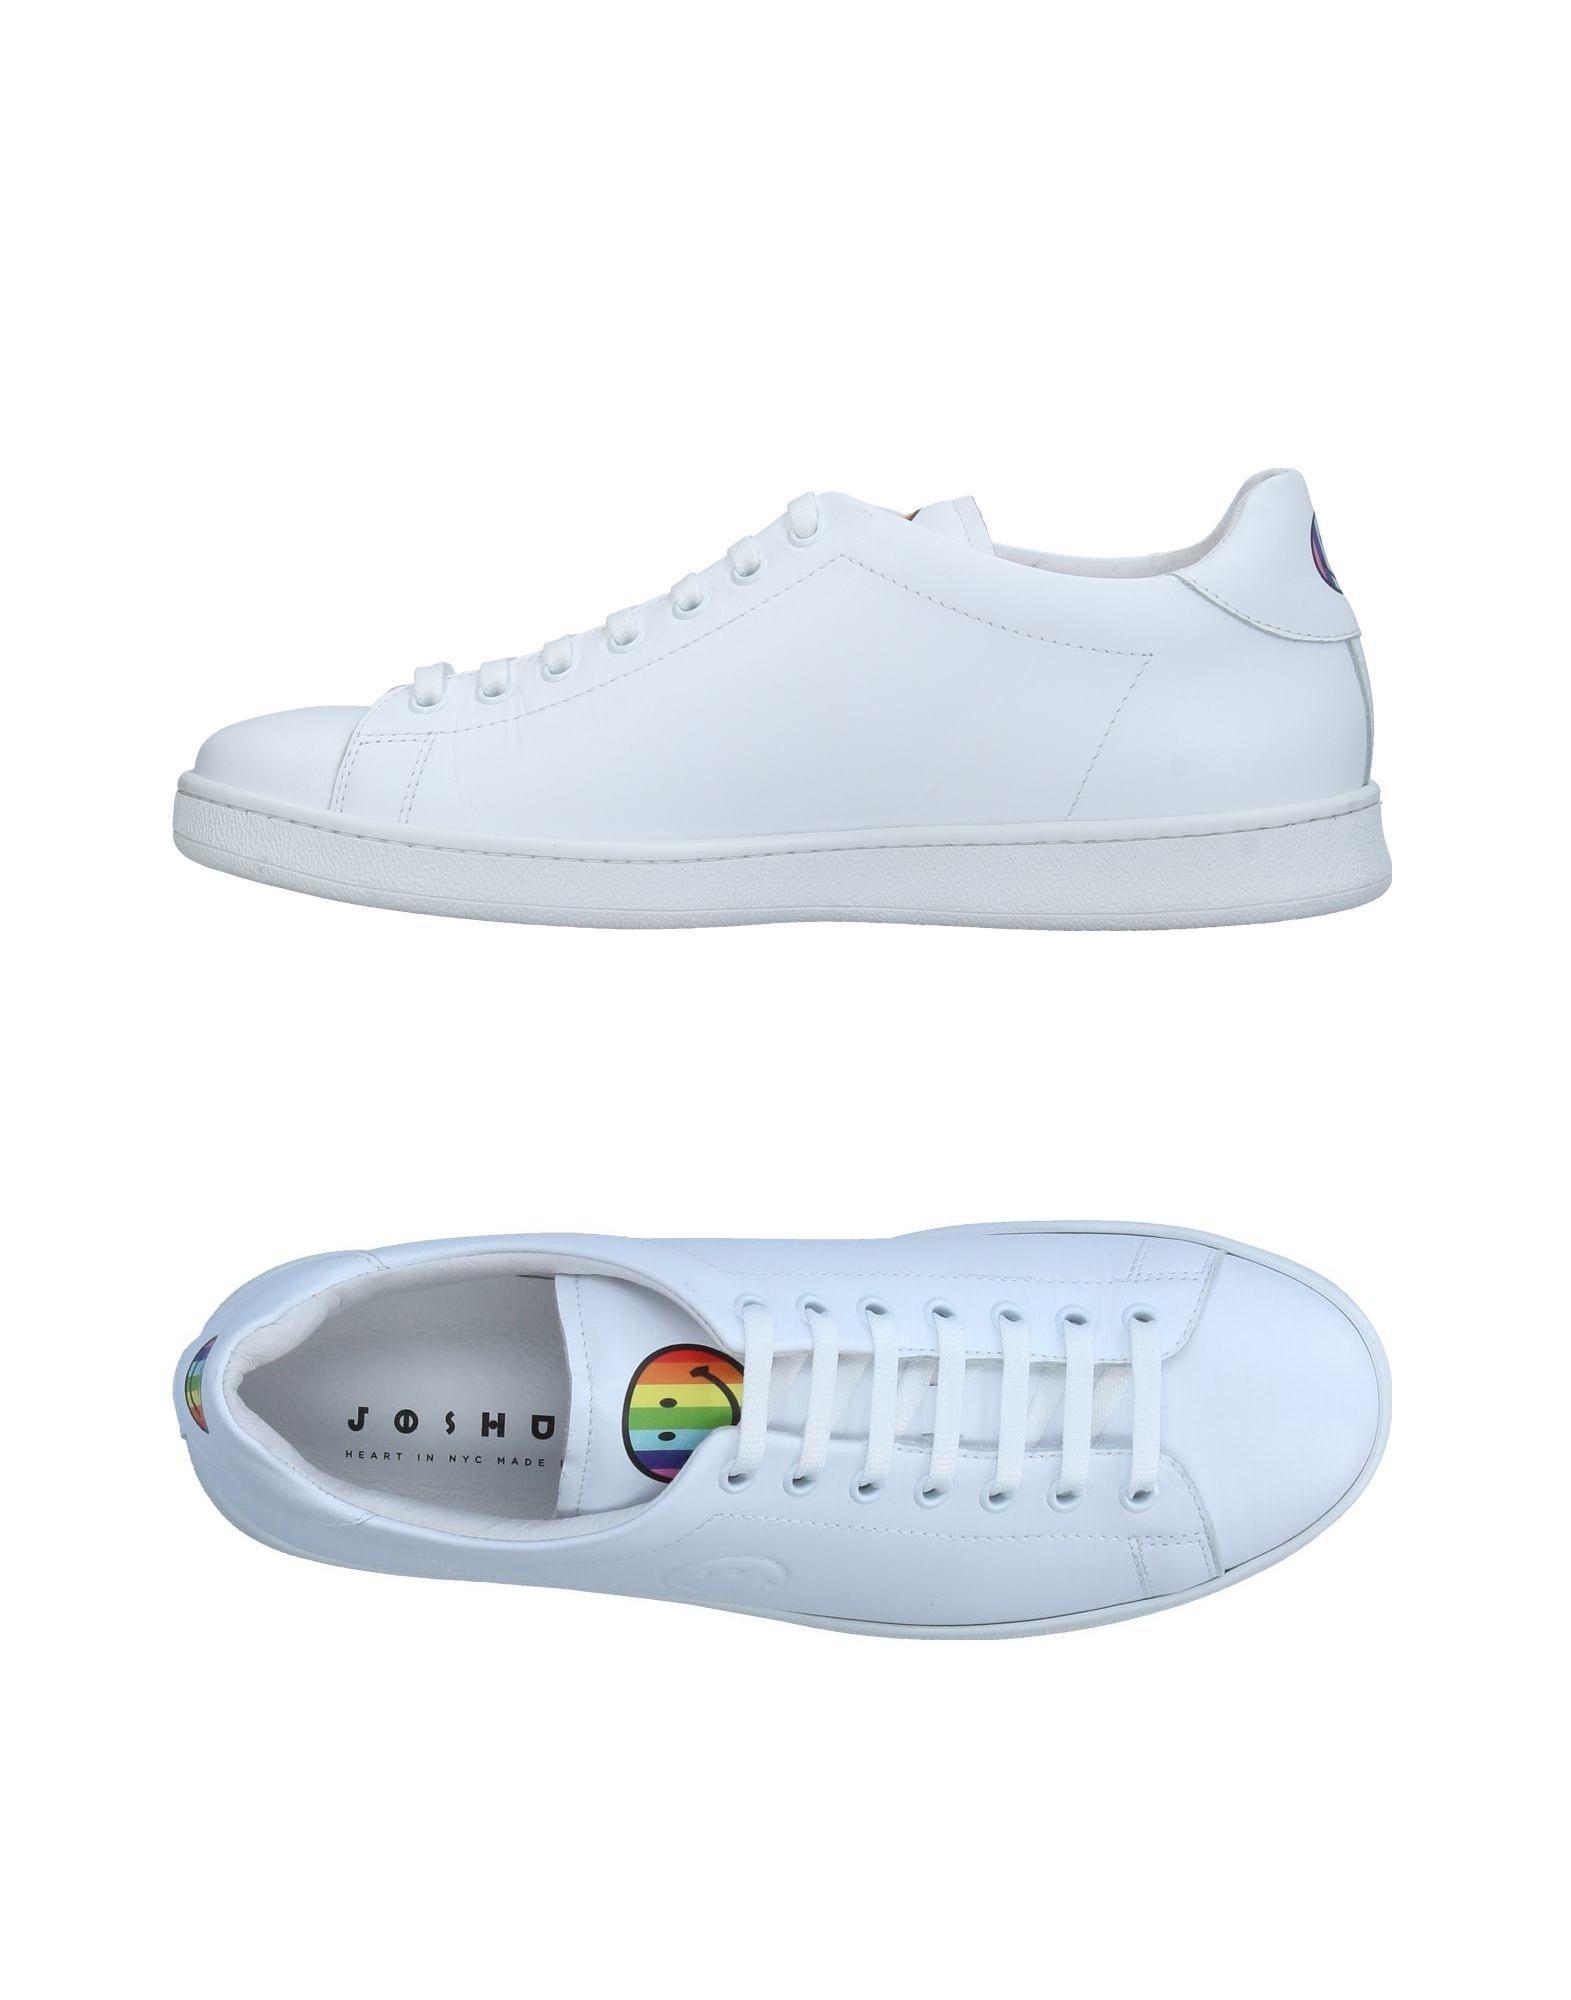 Rabatt Schuhe Joshua*S Sneakers Damen  11337651WS